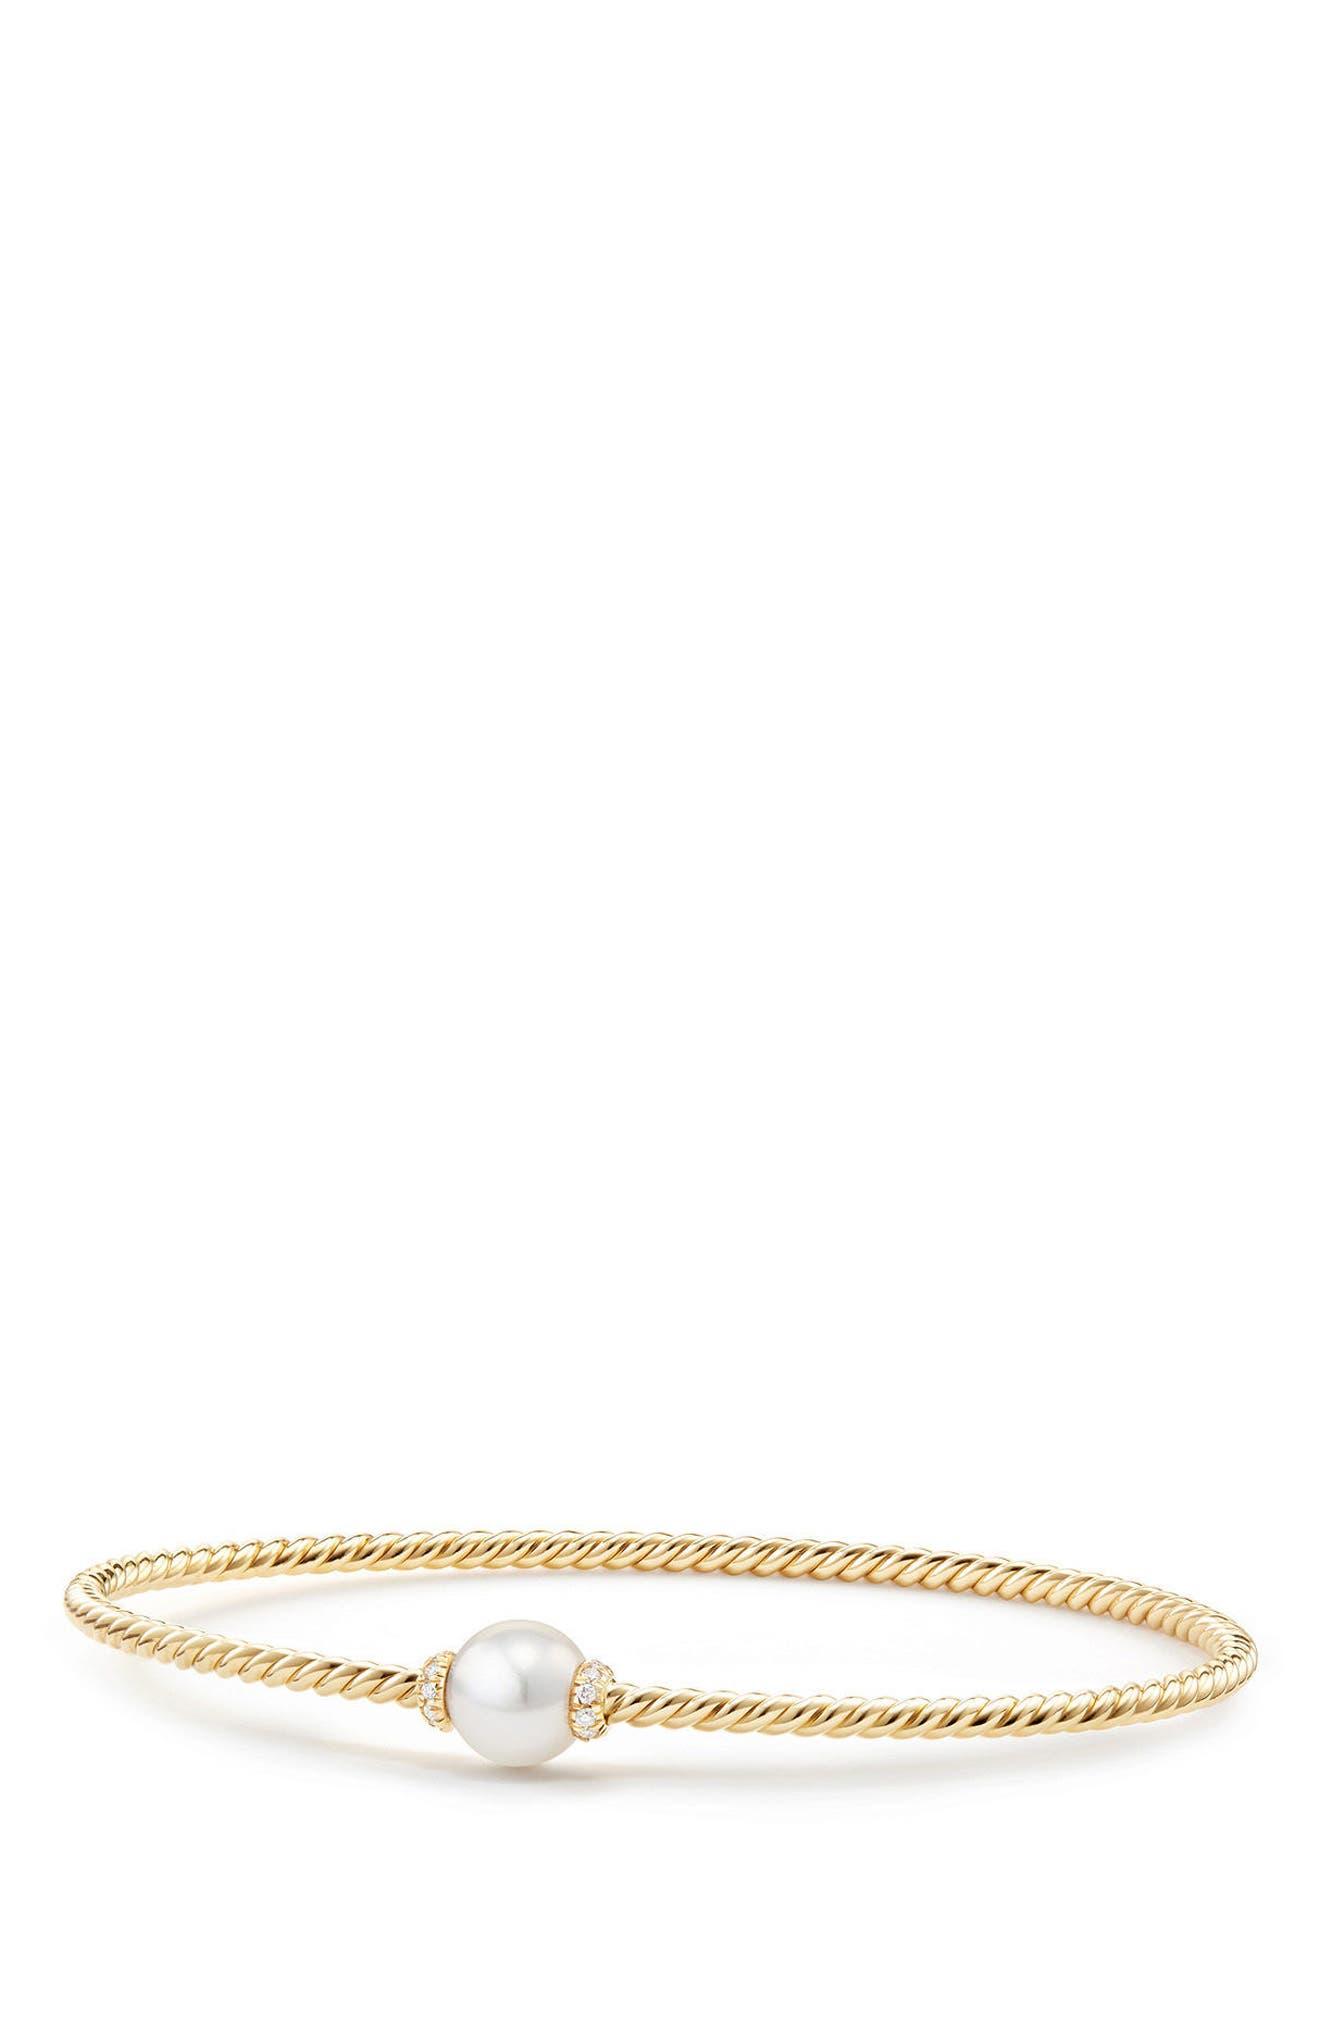 David Yurman Solari Station Bracelet with Cultured Pearl & Diamonds in 18K Gold